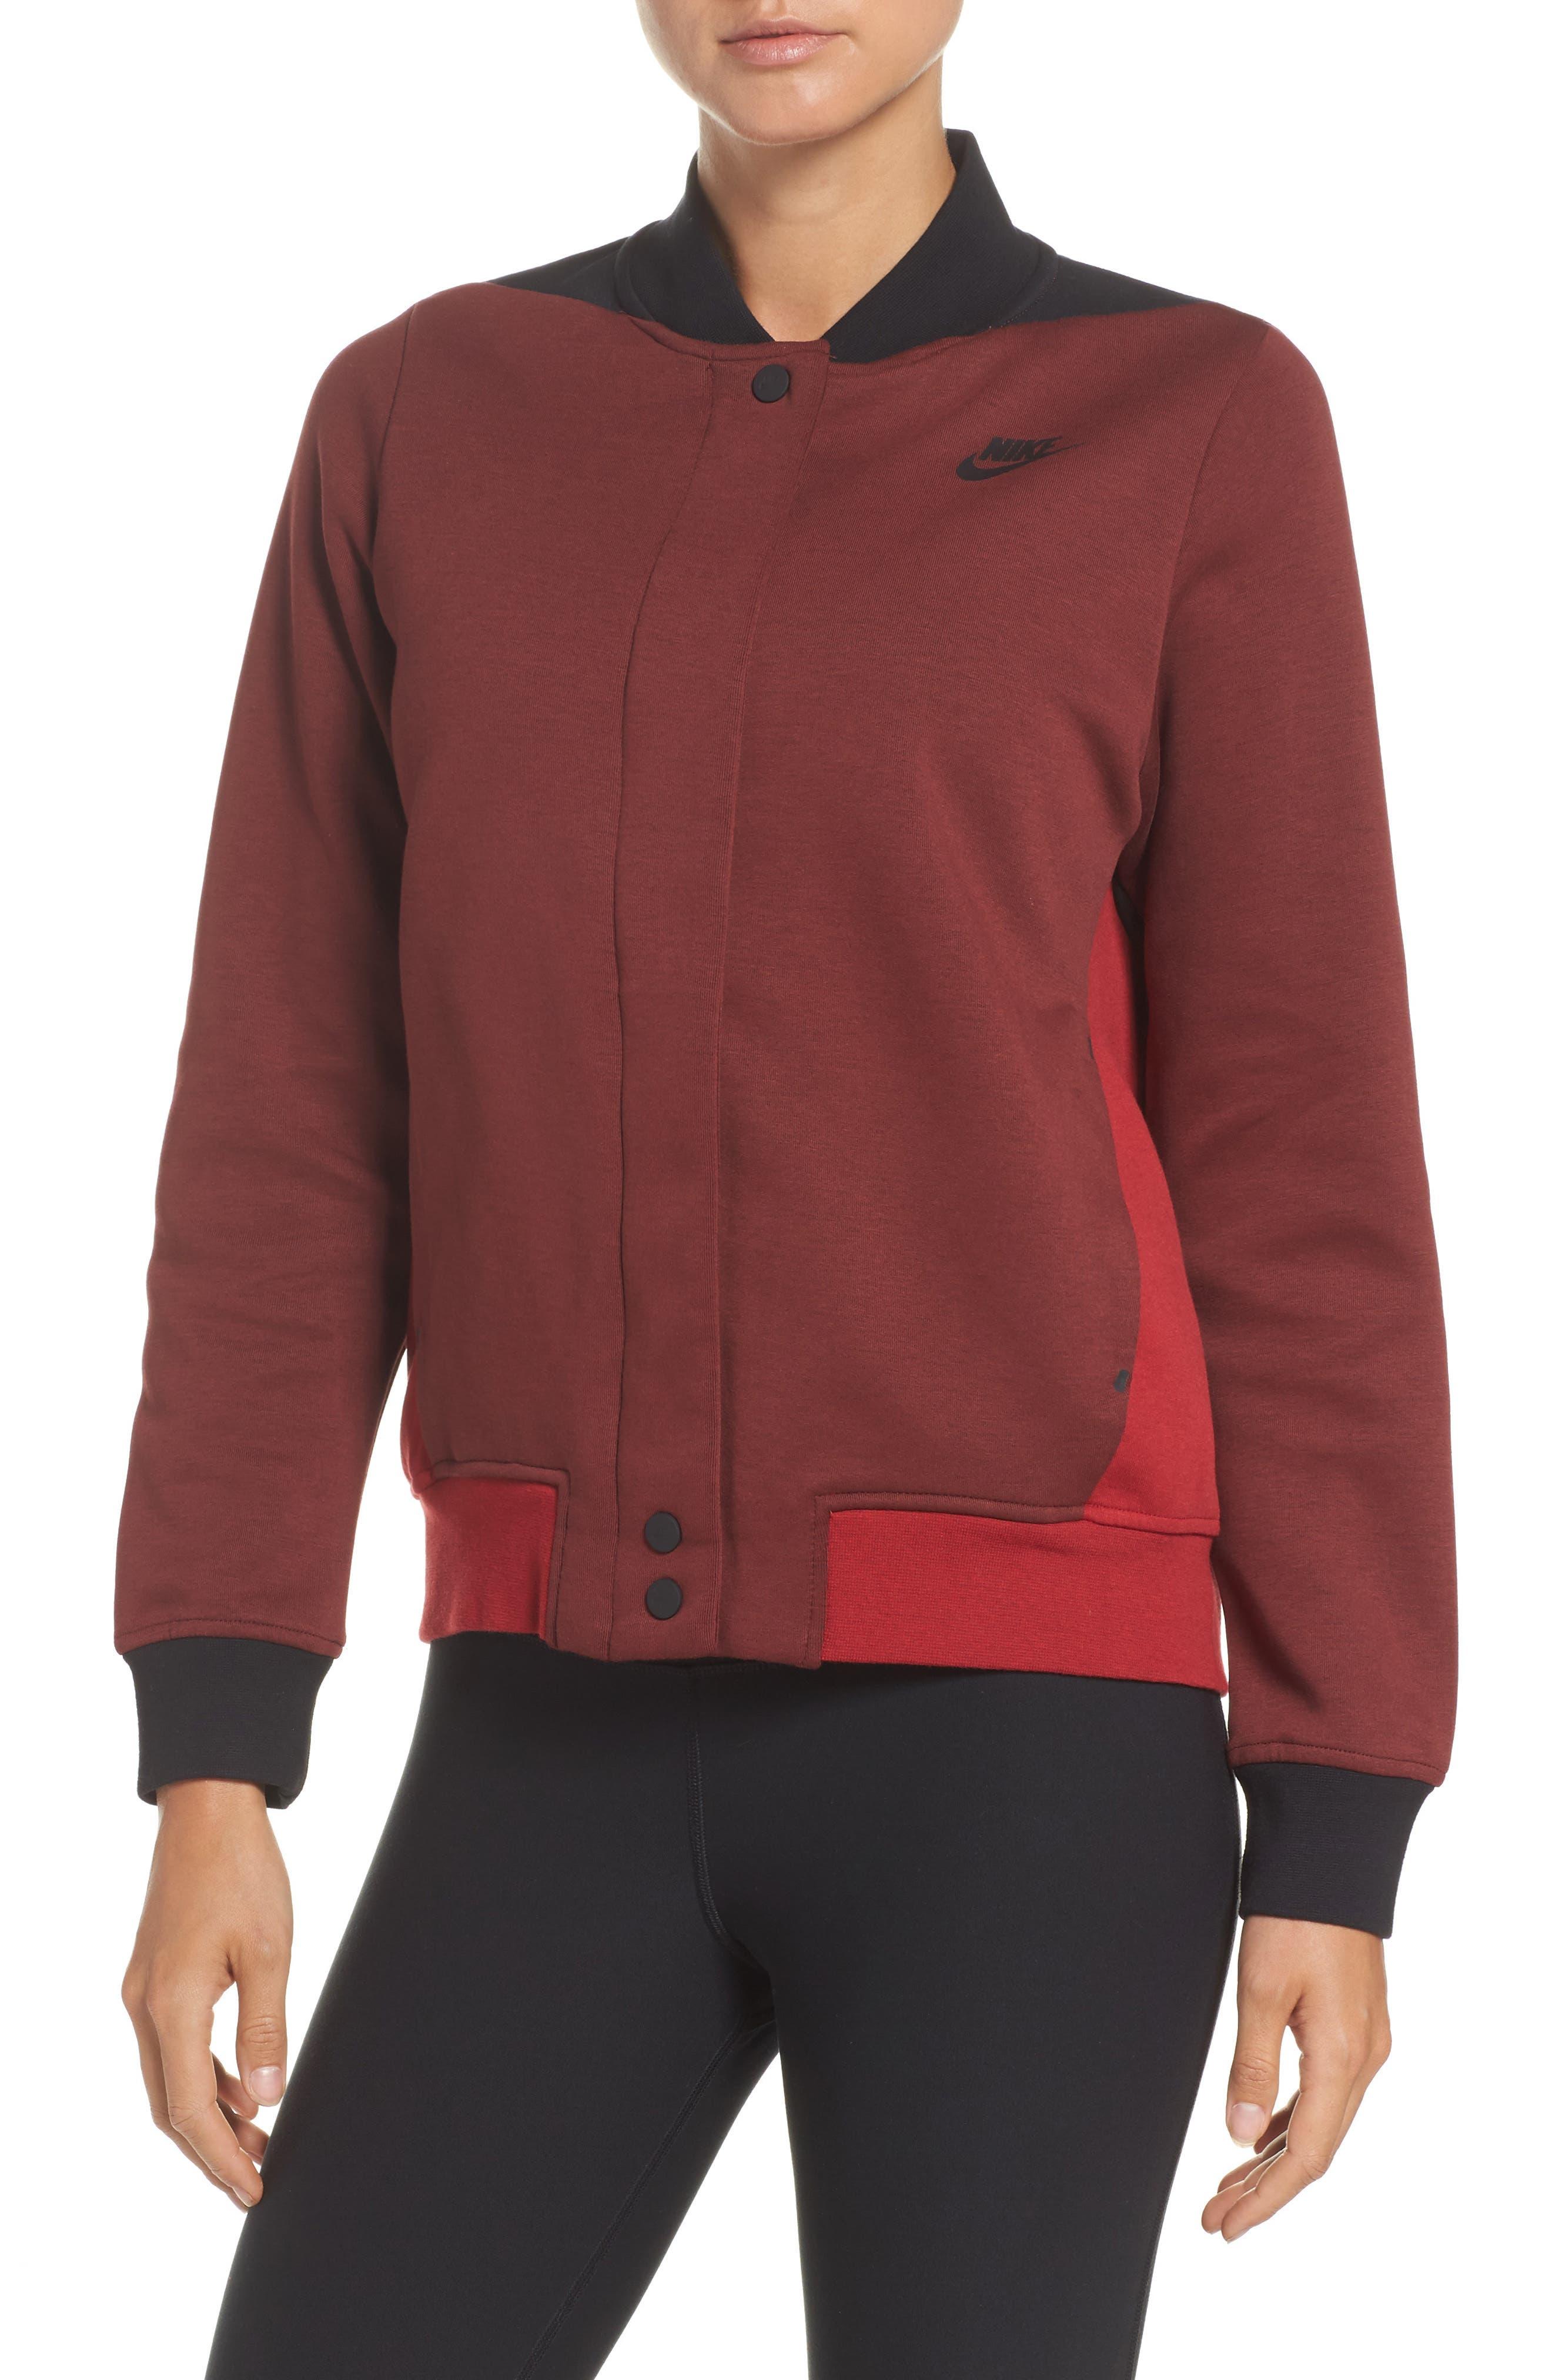 Main Image - Nike Destroyer Track Jacket